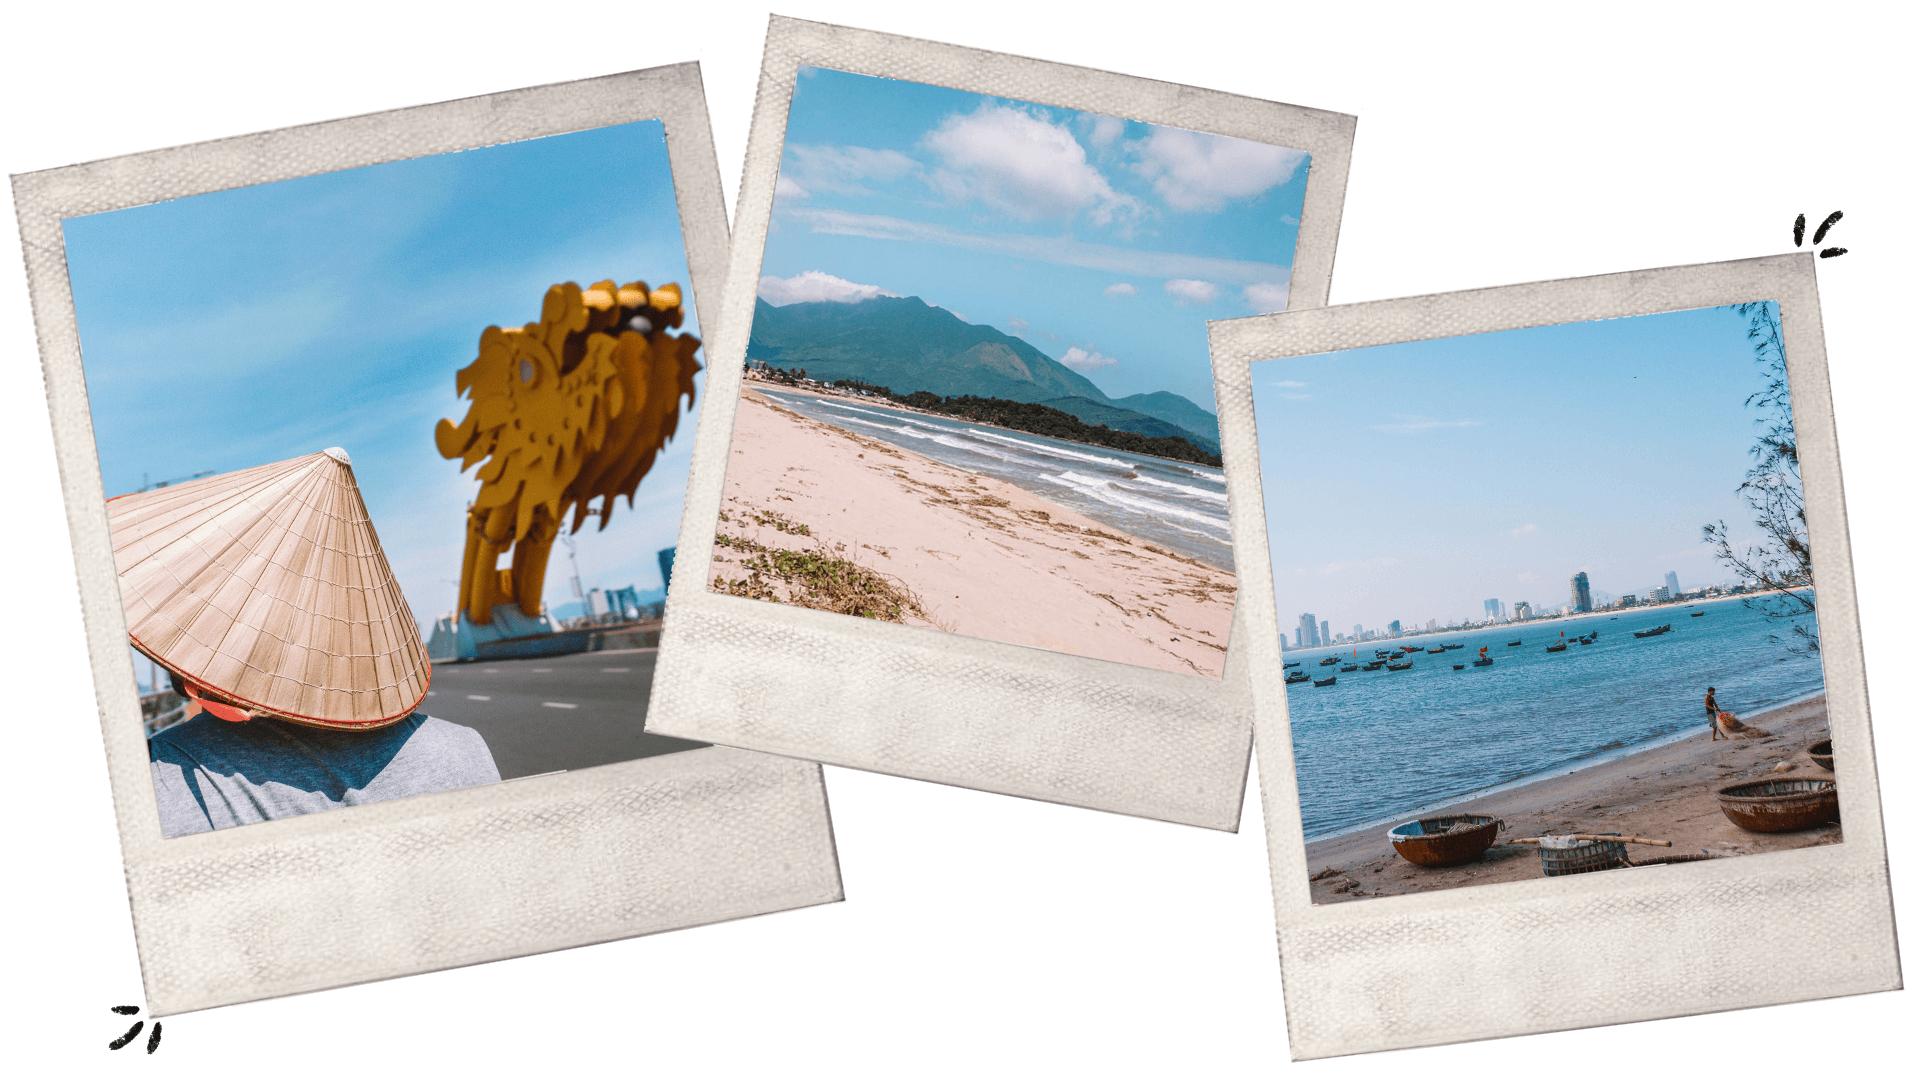 dragon bridge beach basket boats vietnam